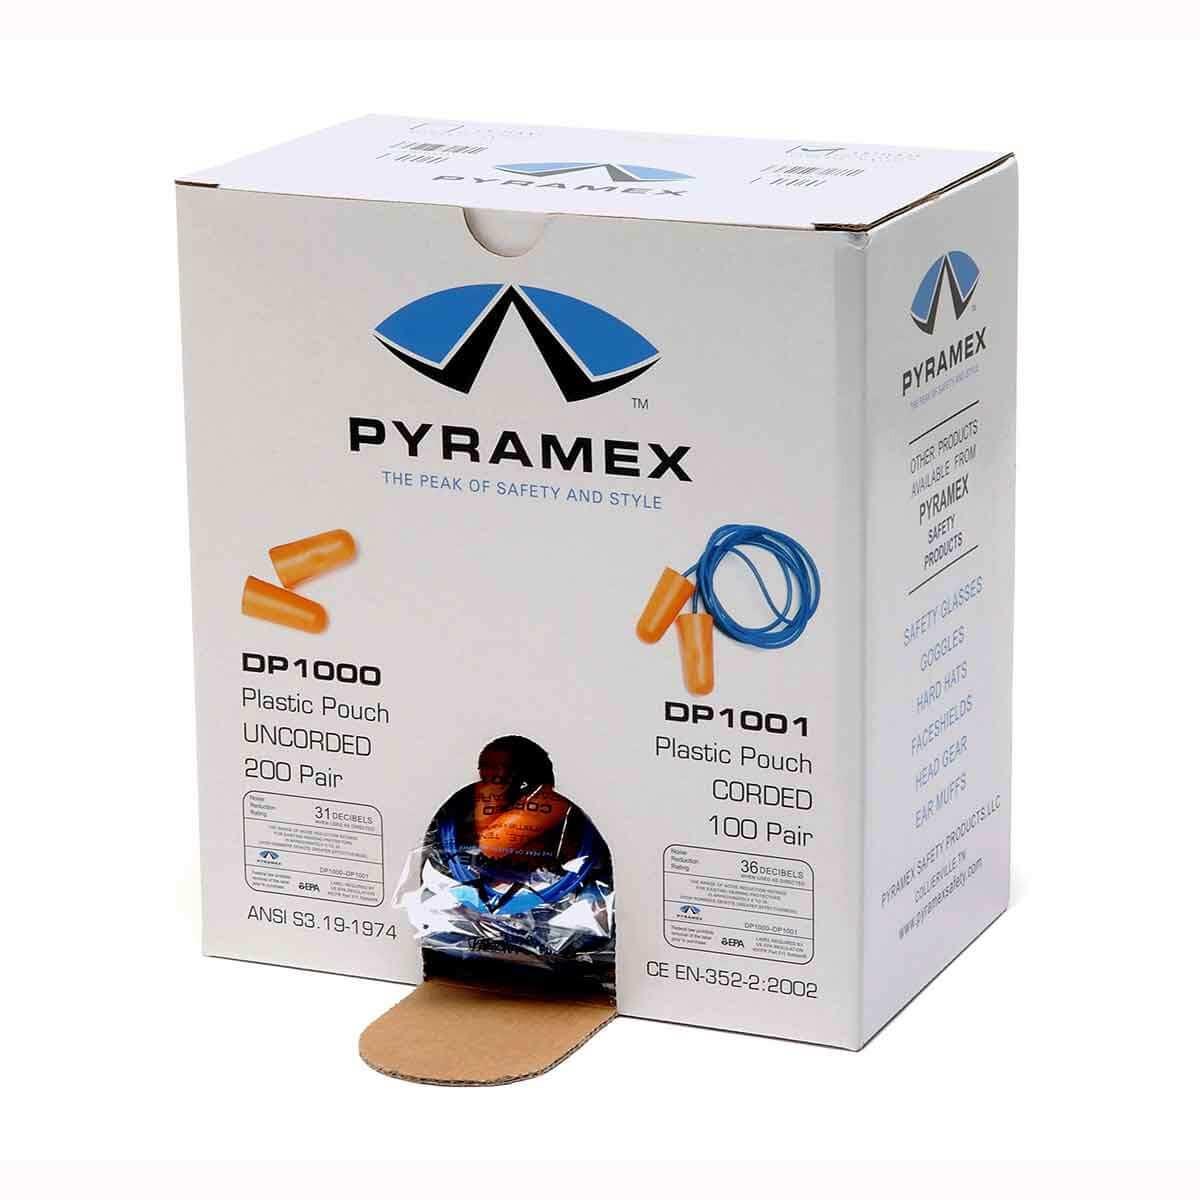 DP1000 200 Piece Box of Ear Plugs